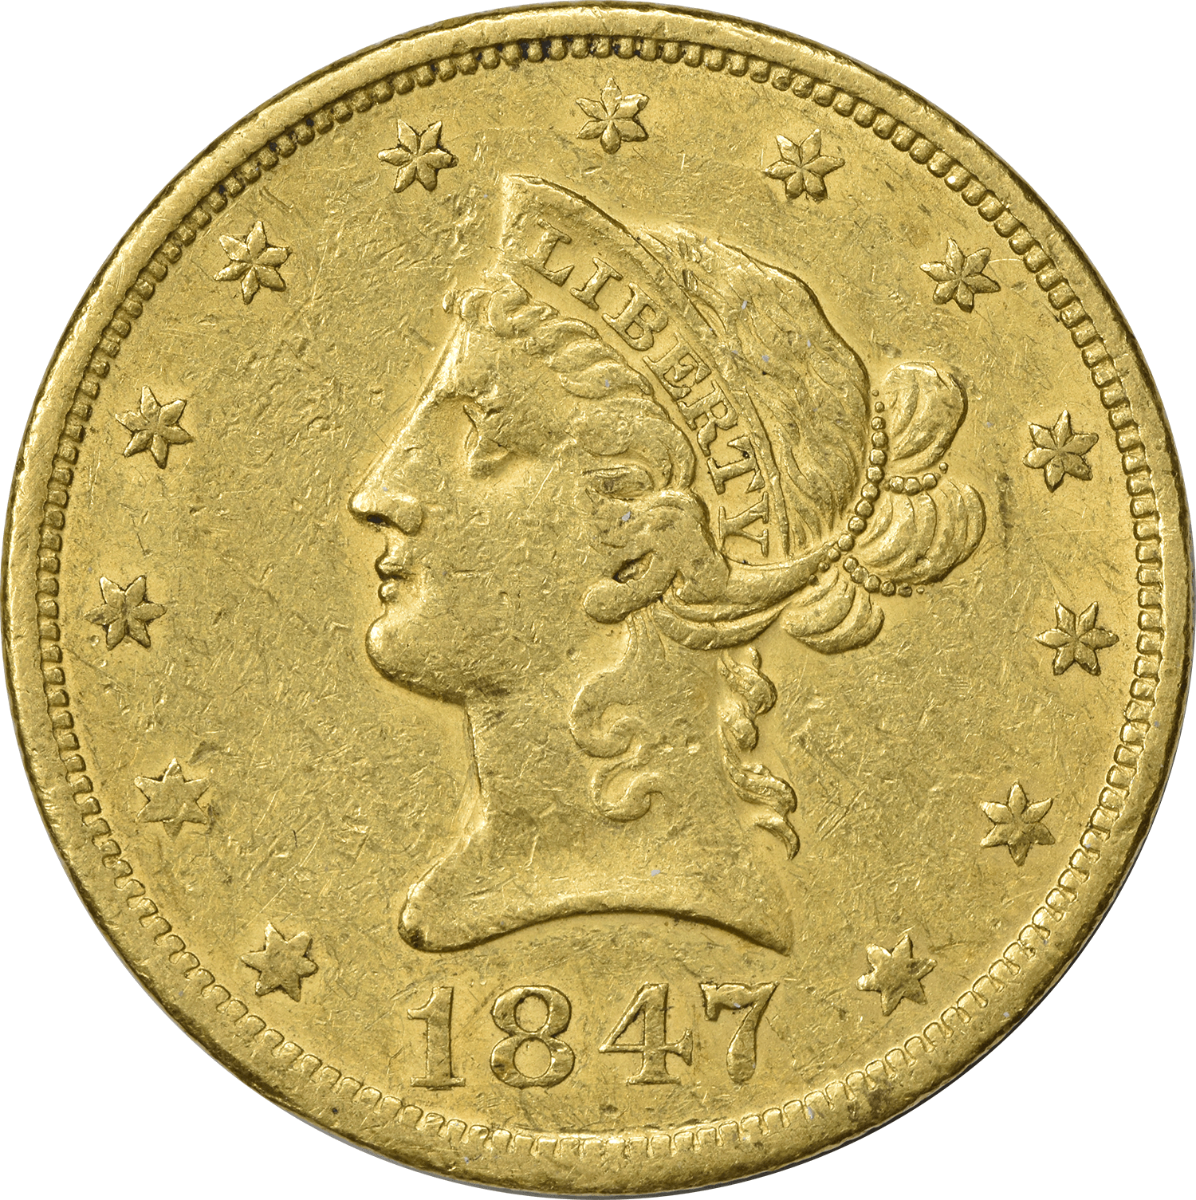 1847-O $10 Gold, EF, Uncertified, Liberty